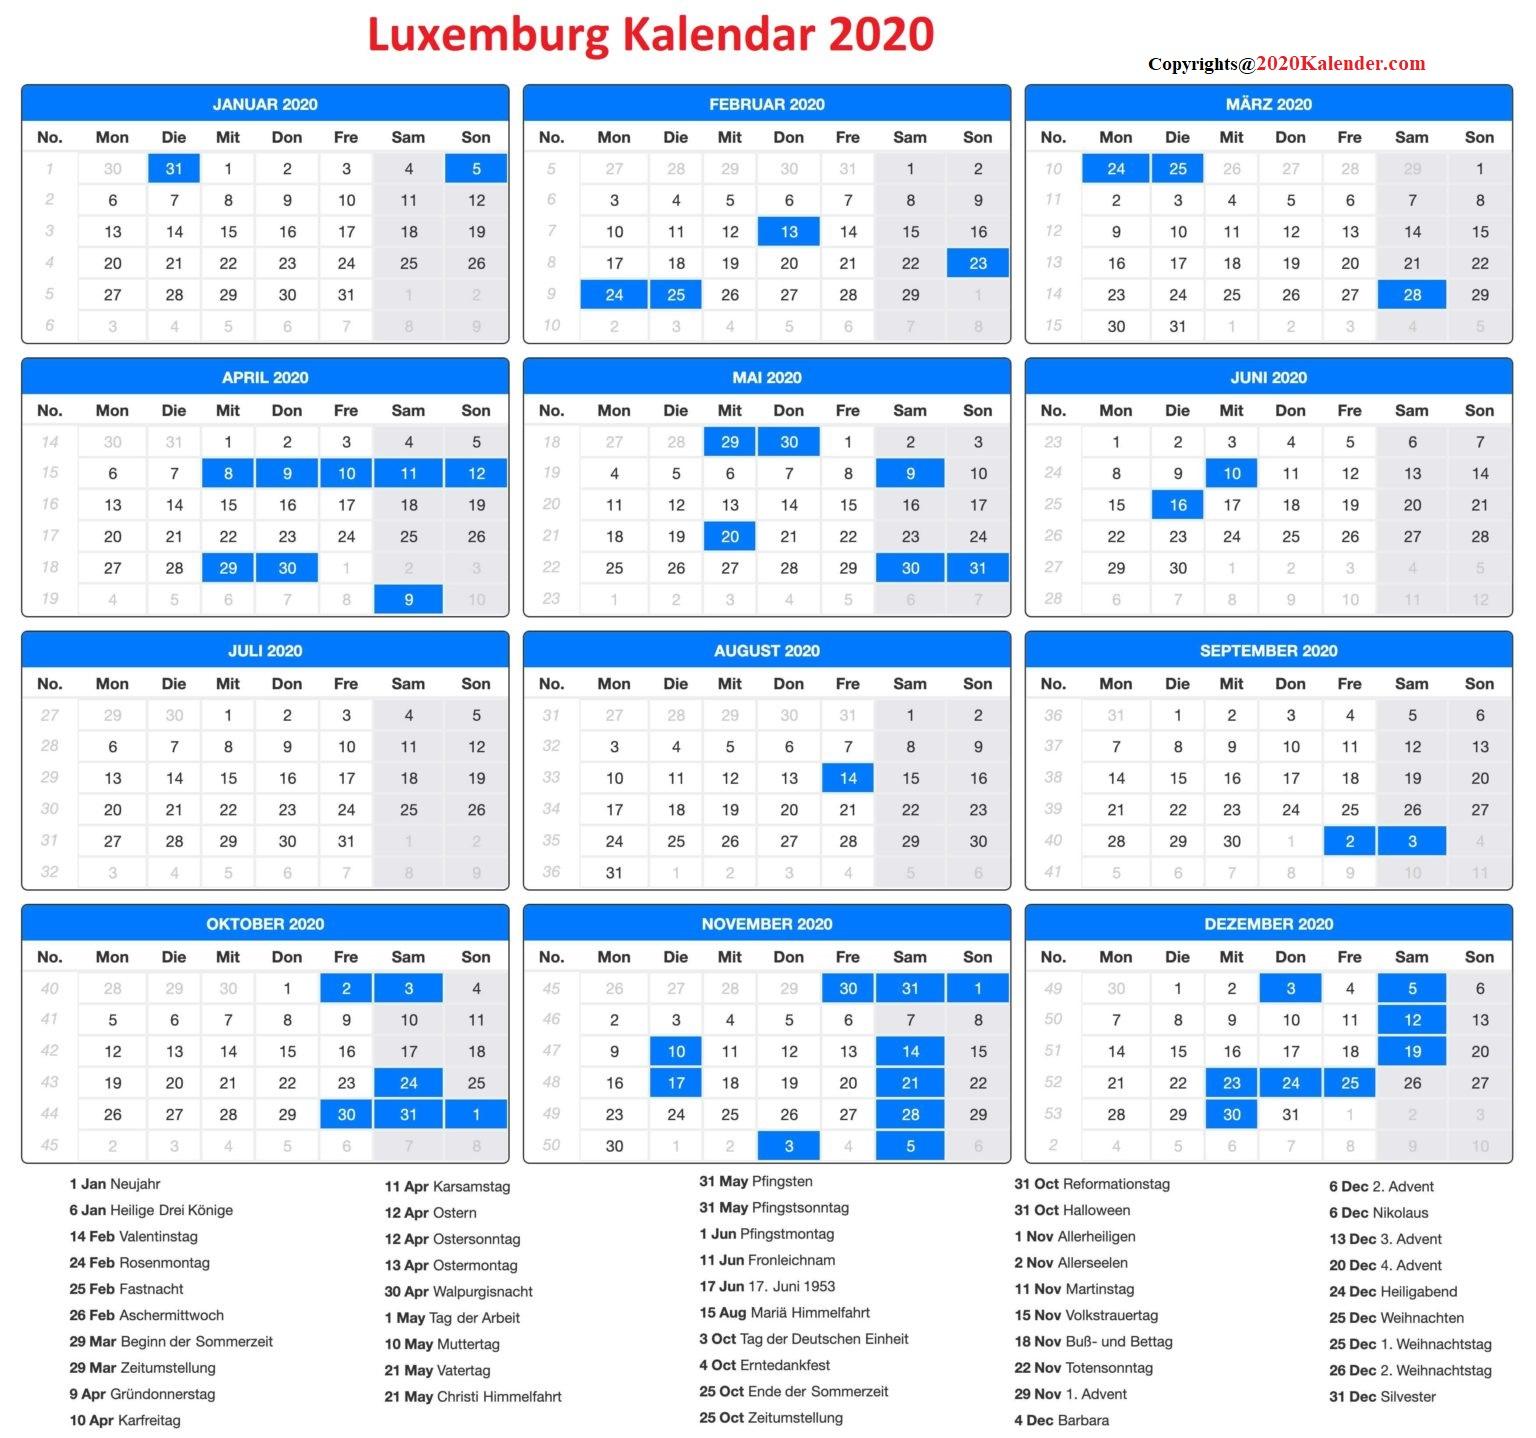 2020 Luxemburg Kalender Feiertage